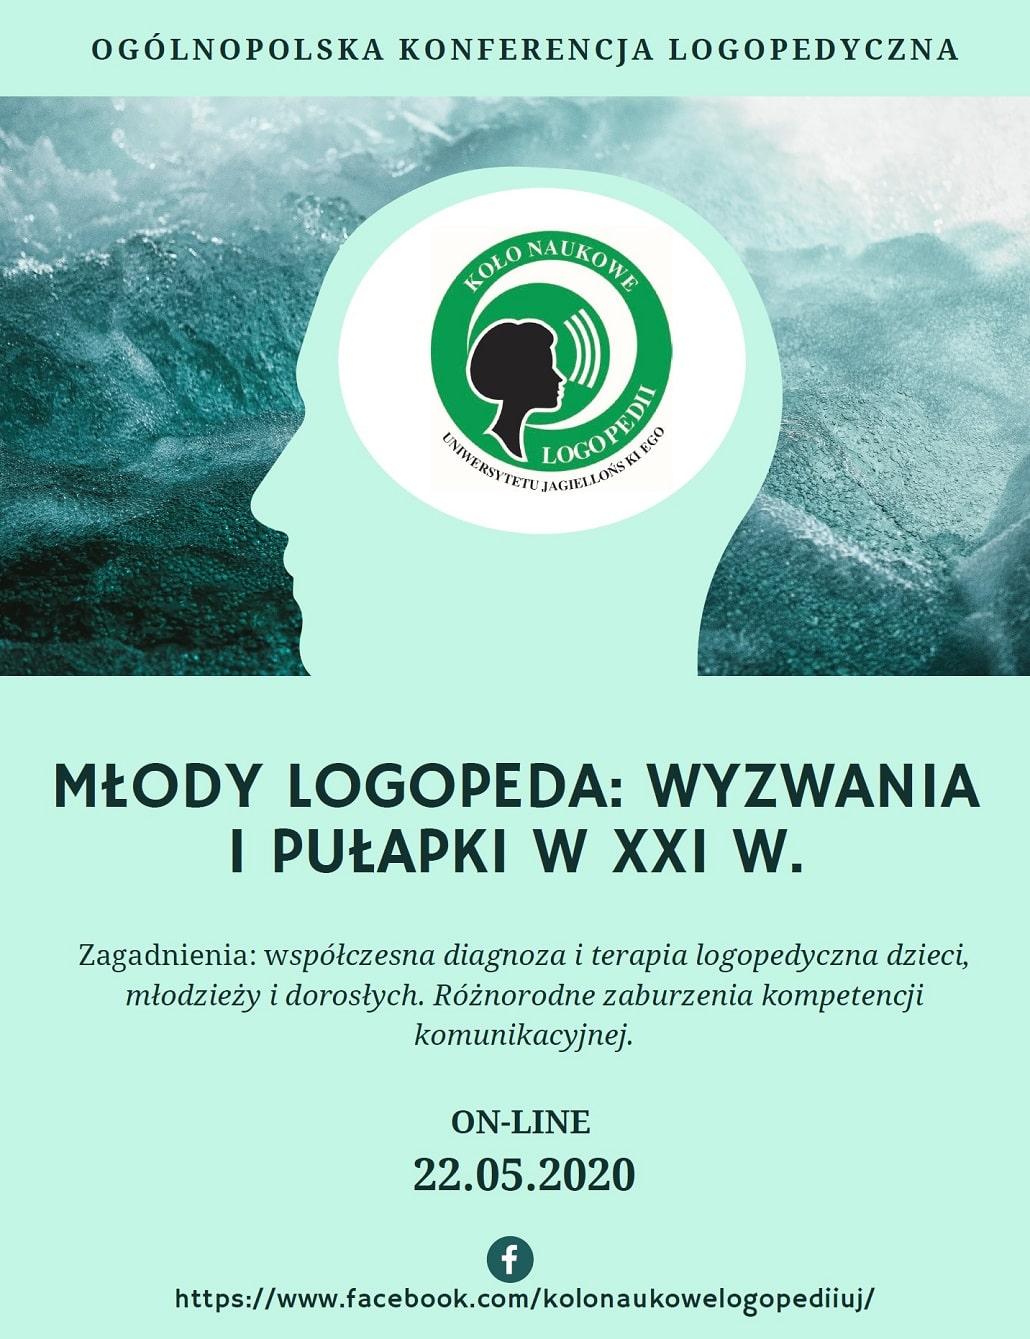 Ogólnopolska Konfernecja Logopedyczna 2020 plakat baner